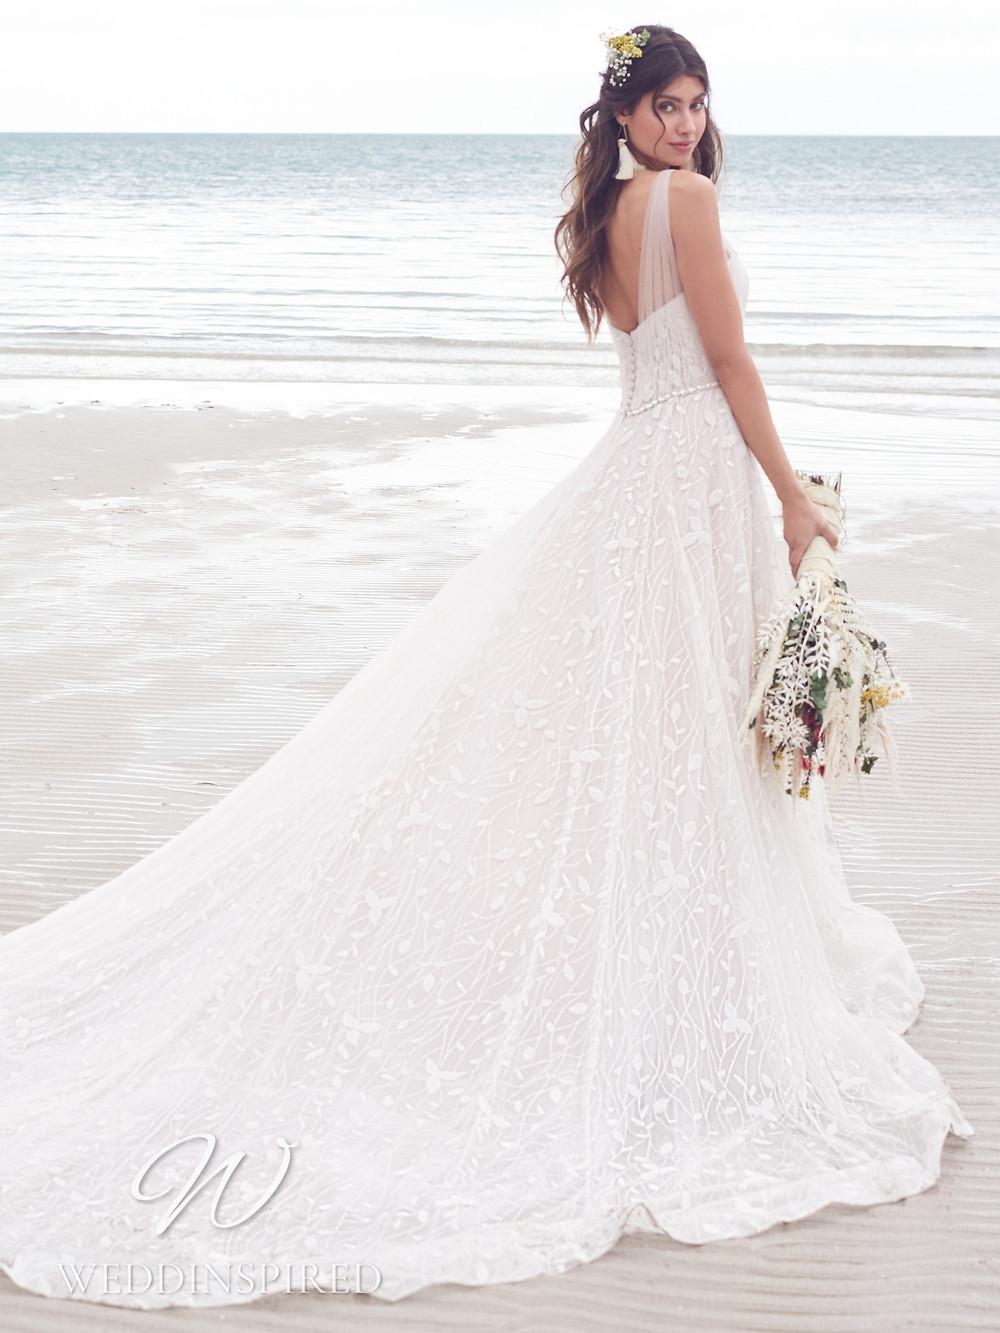 A Rebecca Ingram 2021 boho lace A-line wedding dress